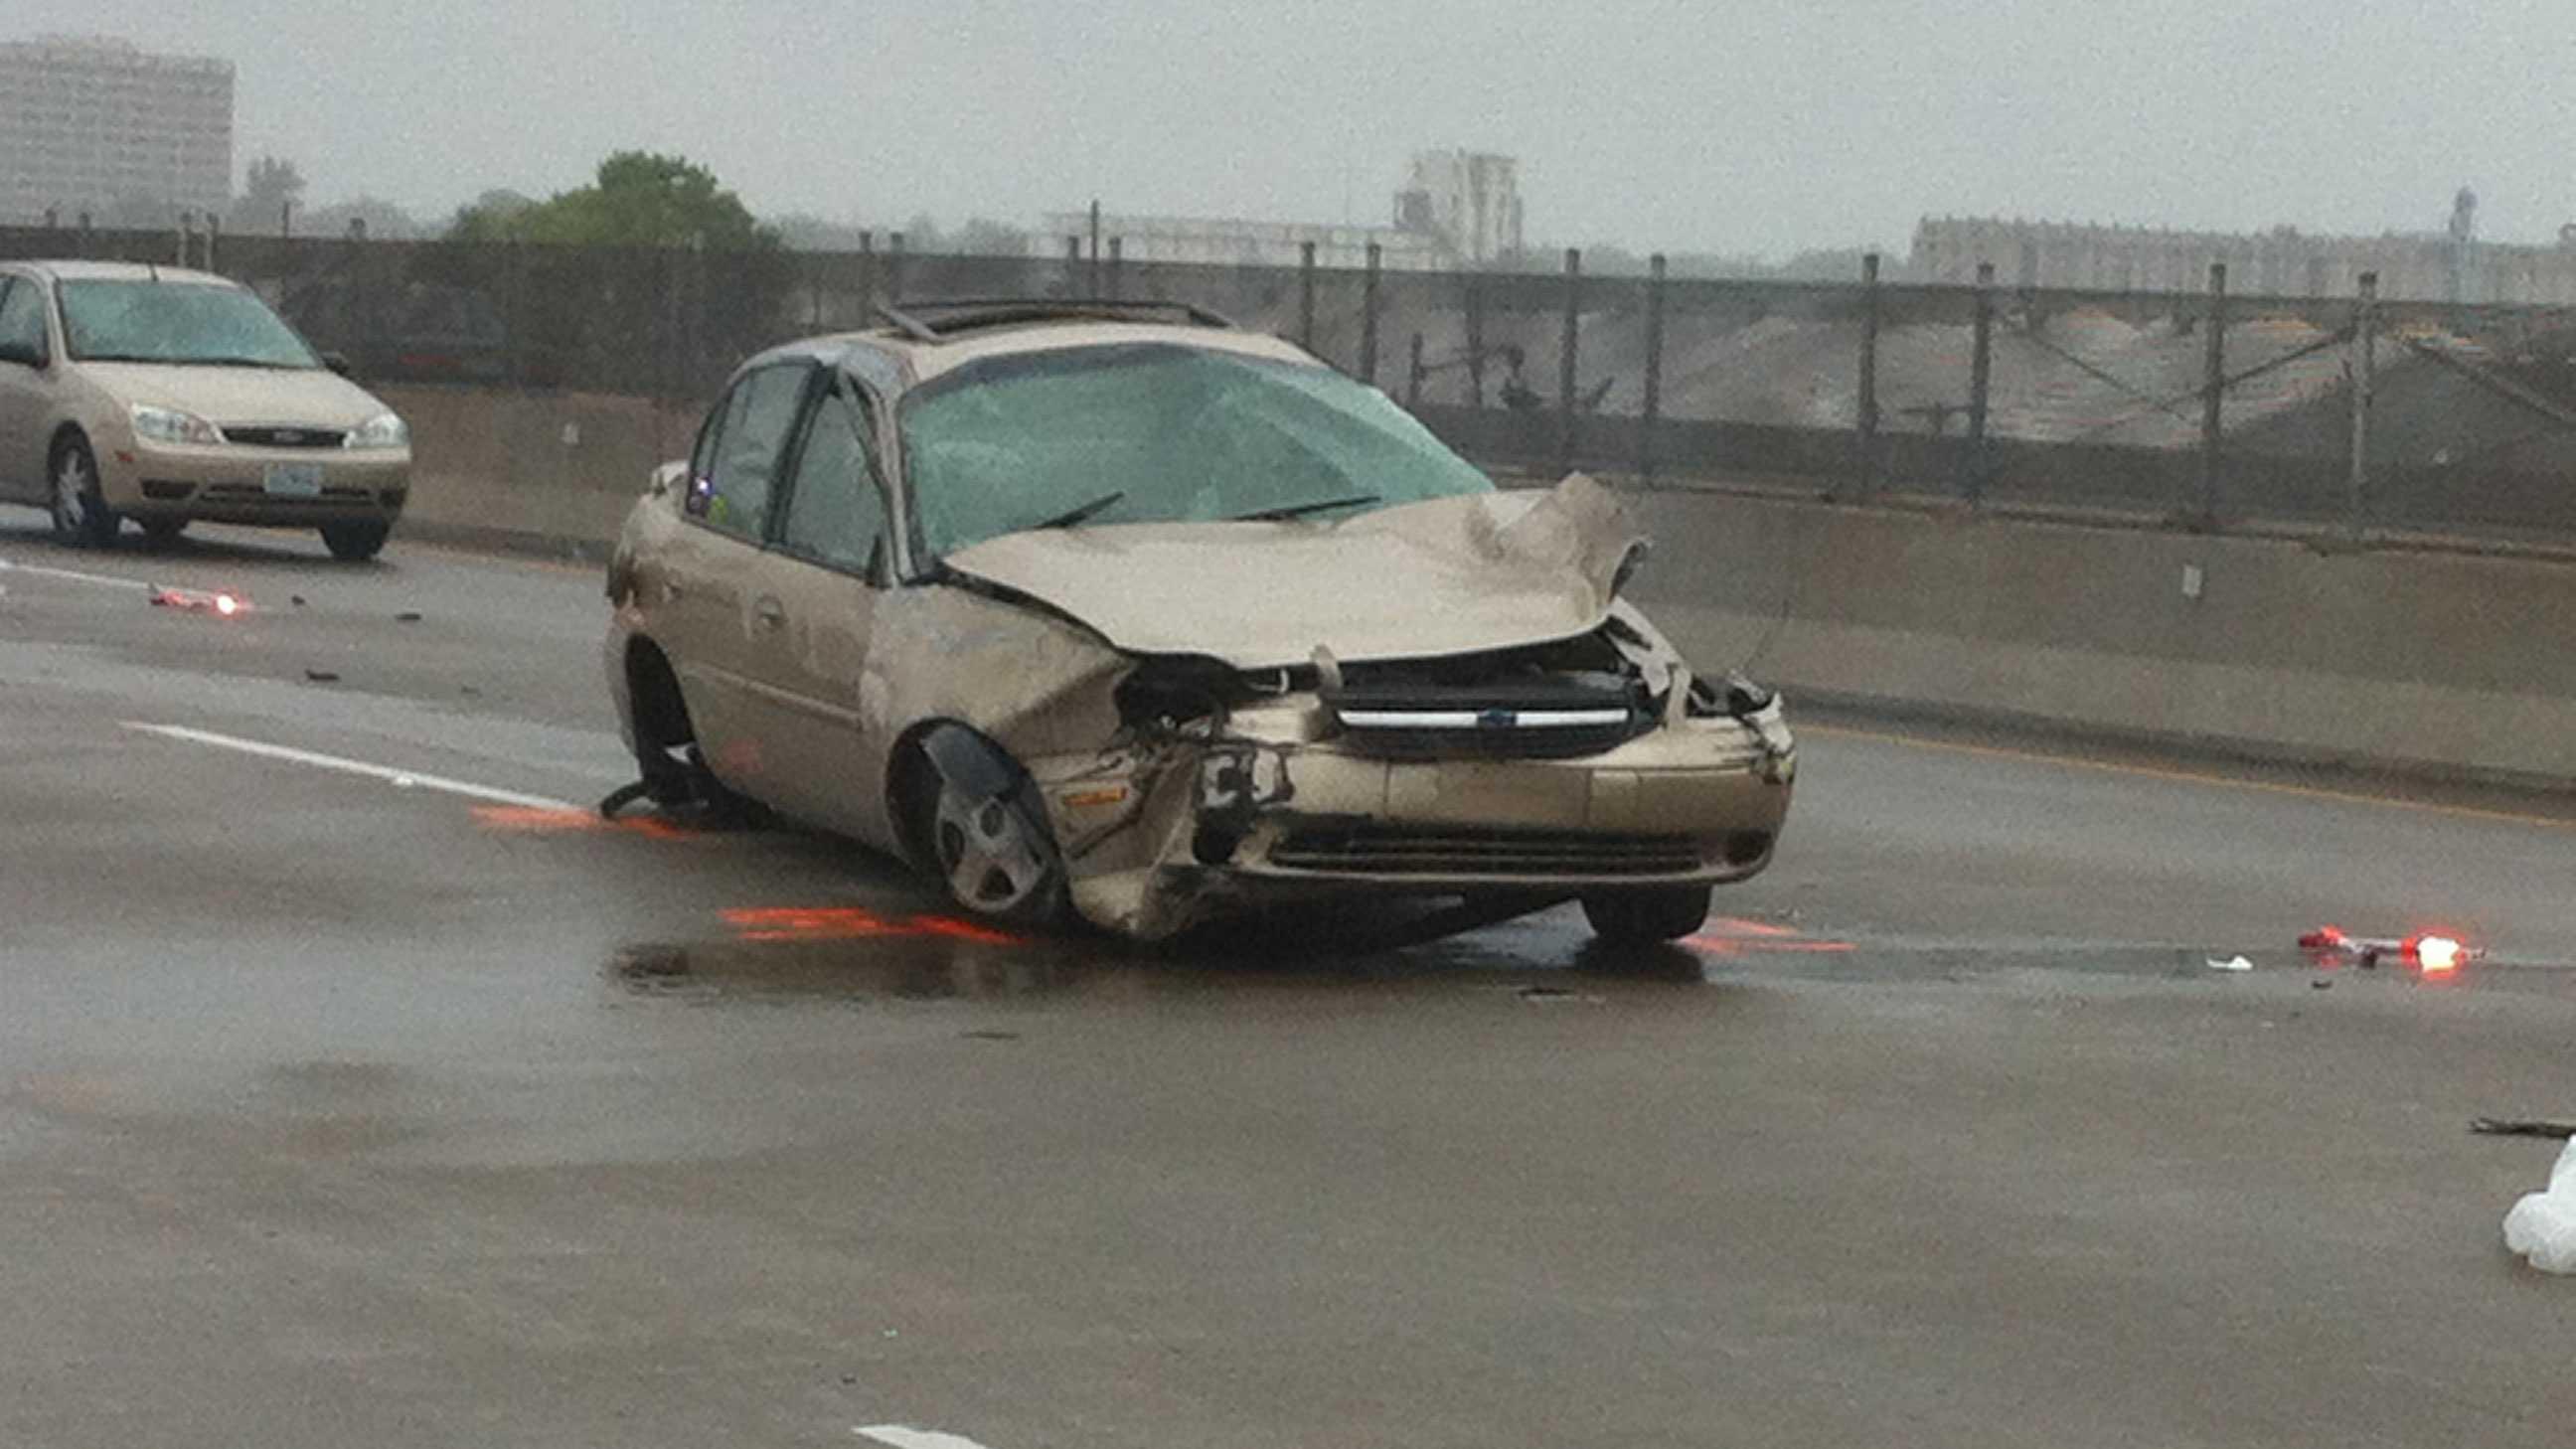 I-70, Fairfax Trafficway crash